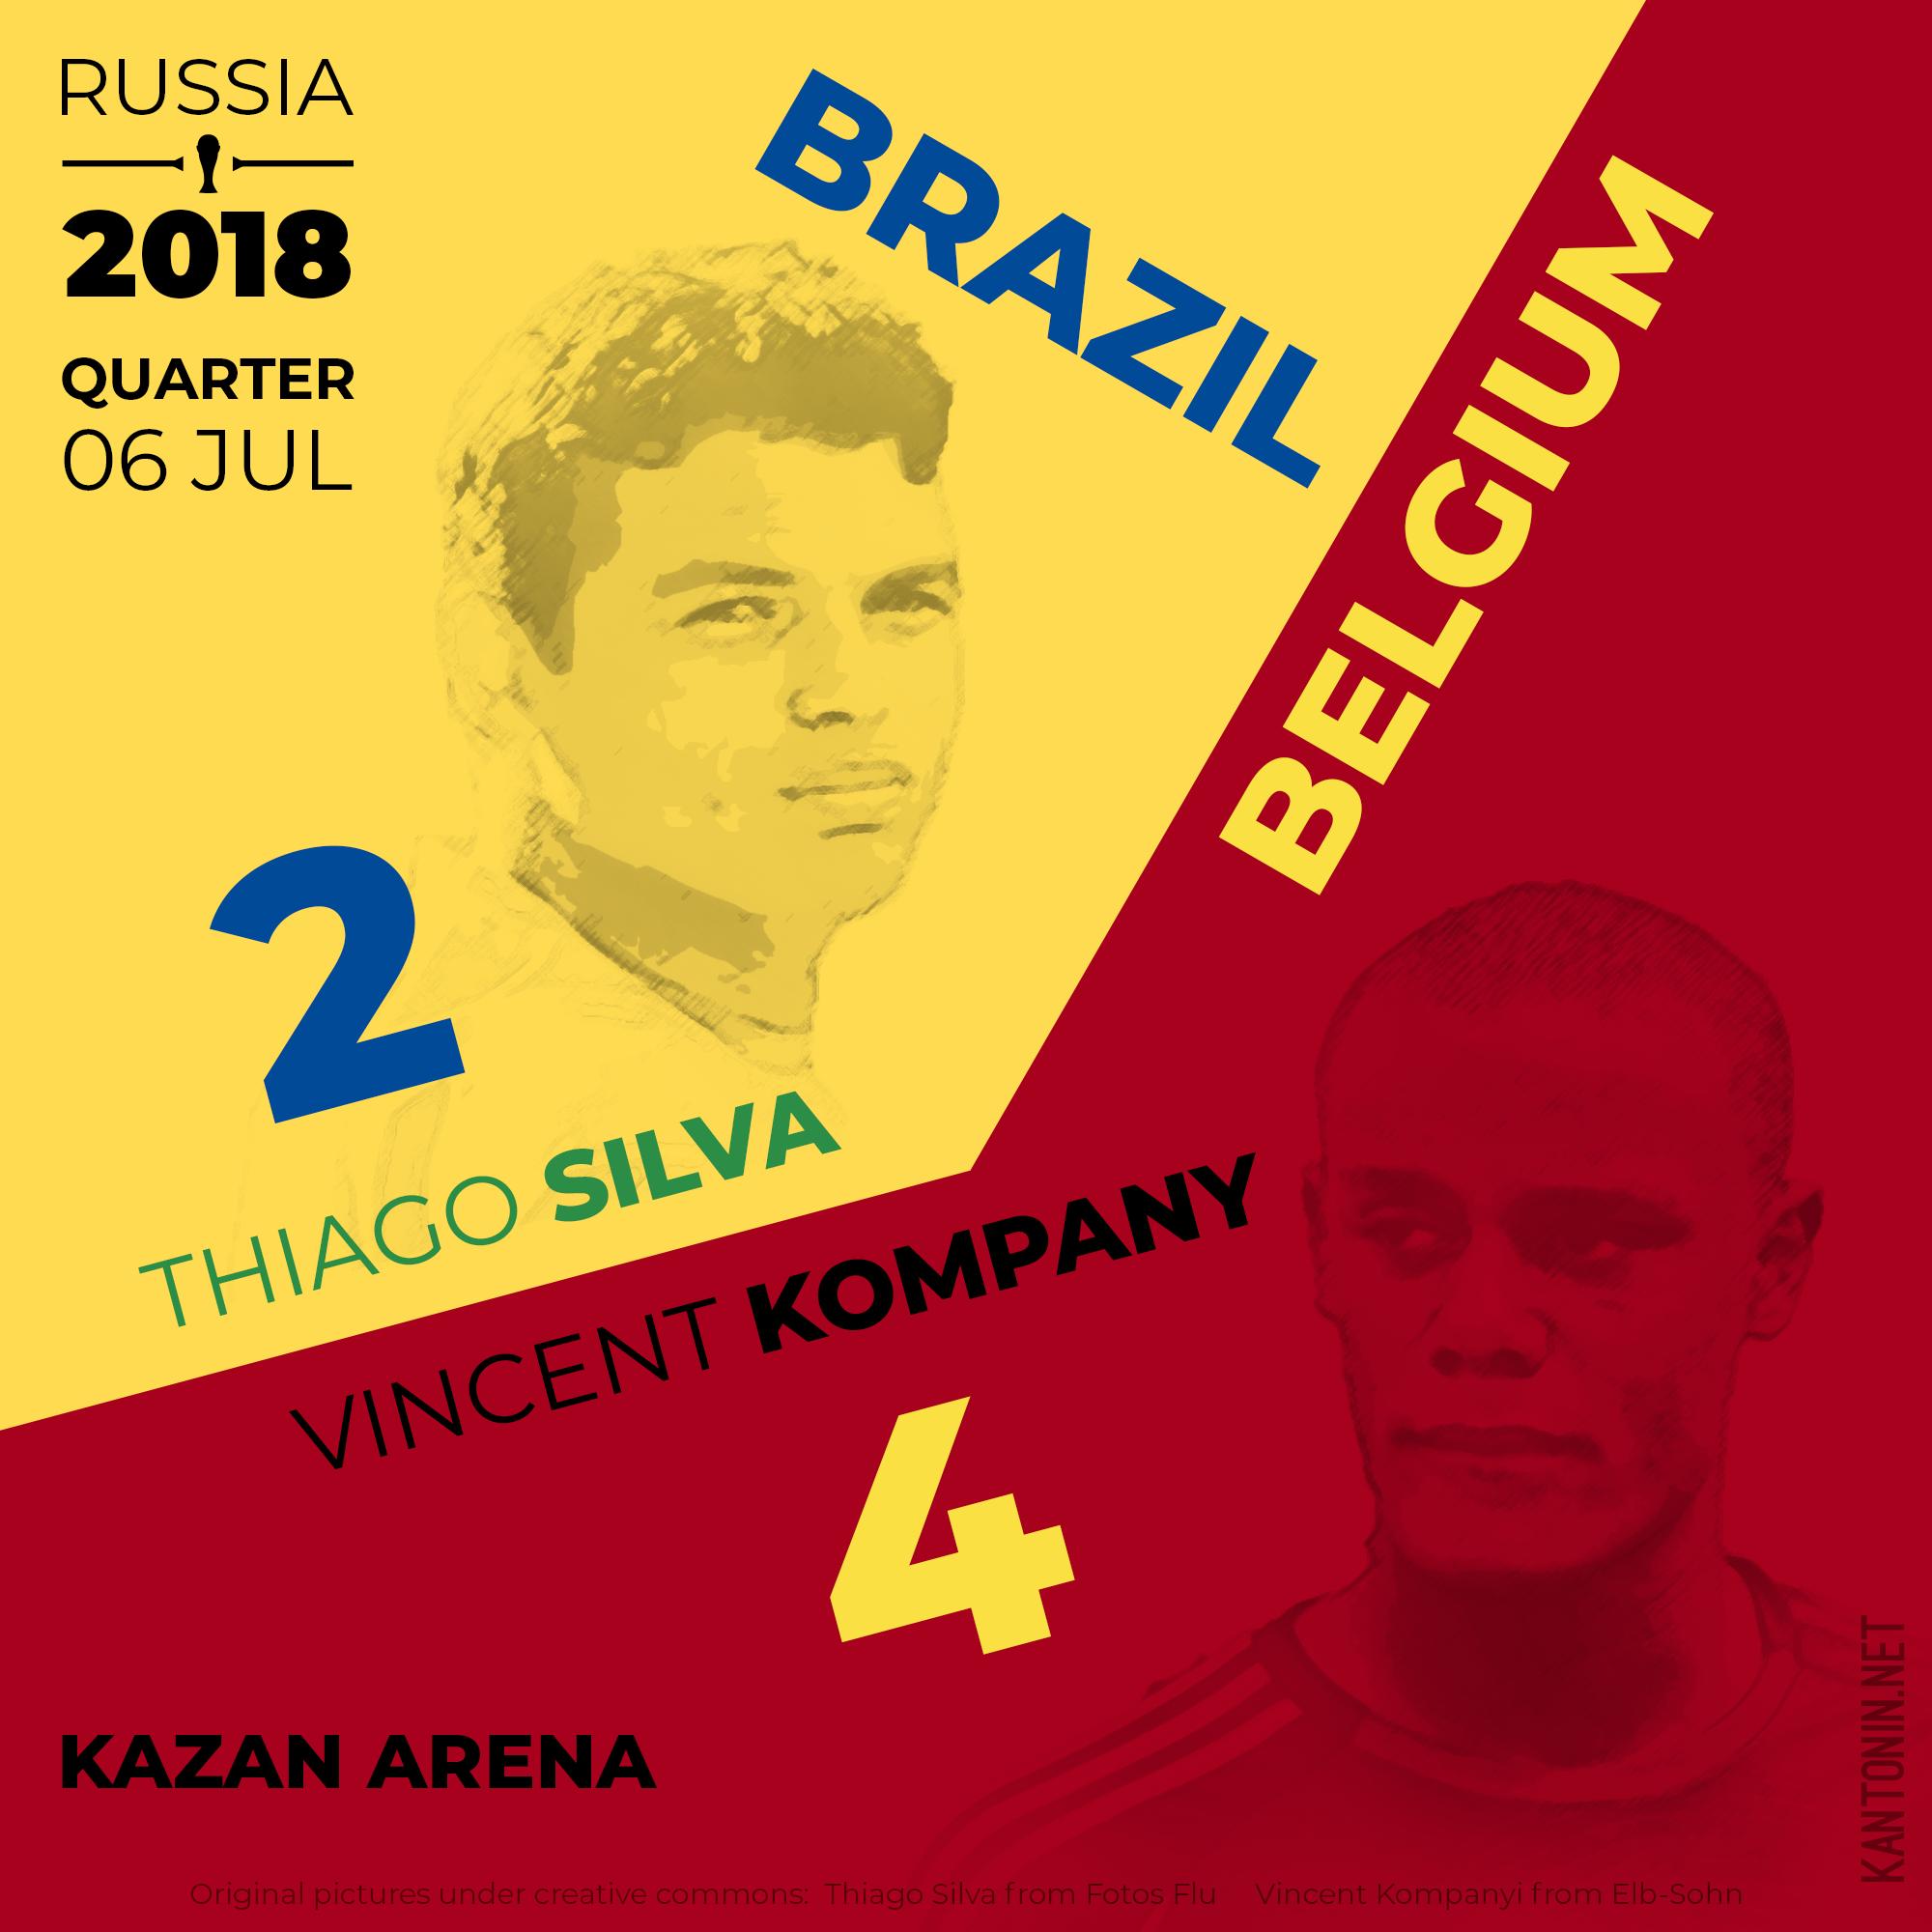 brazil-belgium_russia2018_Antonin-Kaminski